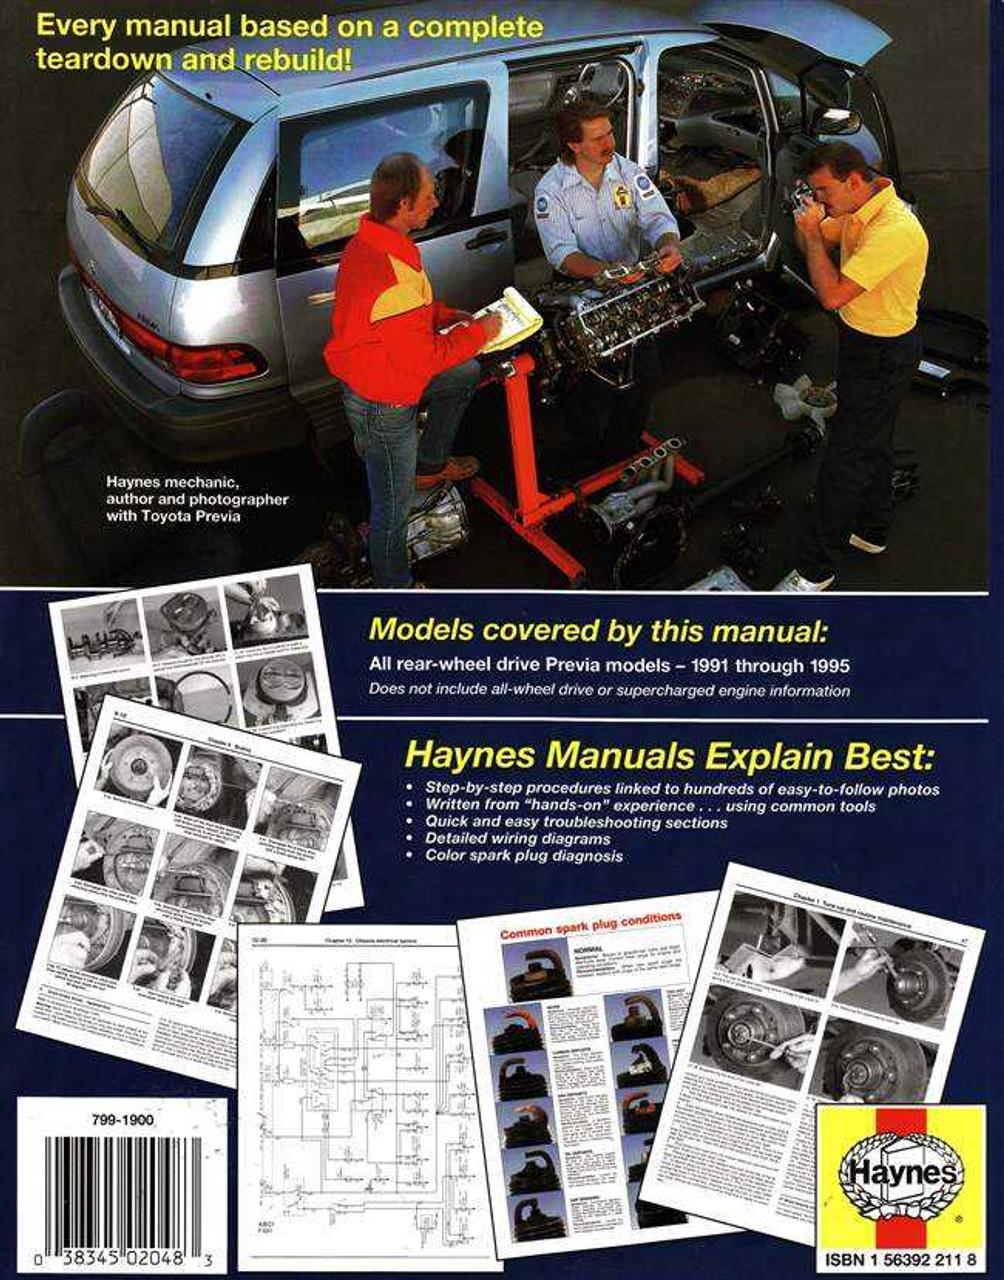 toyota tarago previa 1991 1995 workshop manual rh automotobookshop com au toyota tarago 1996 workshop manual toyota tarago workshop manual